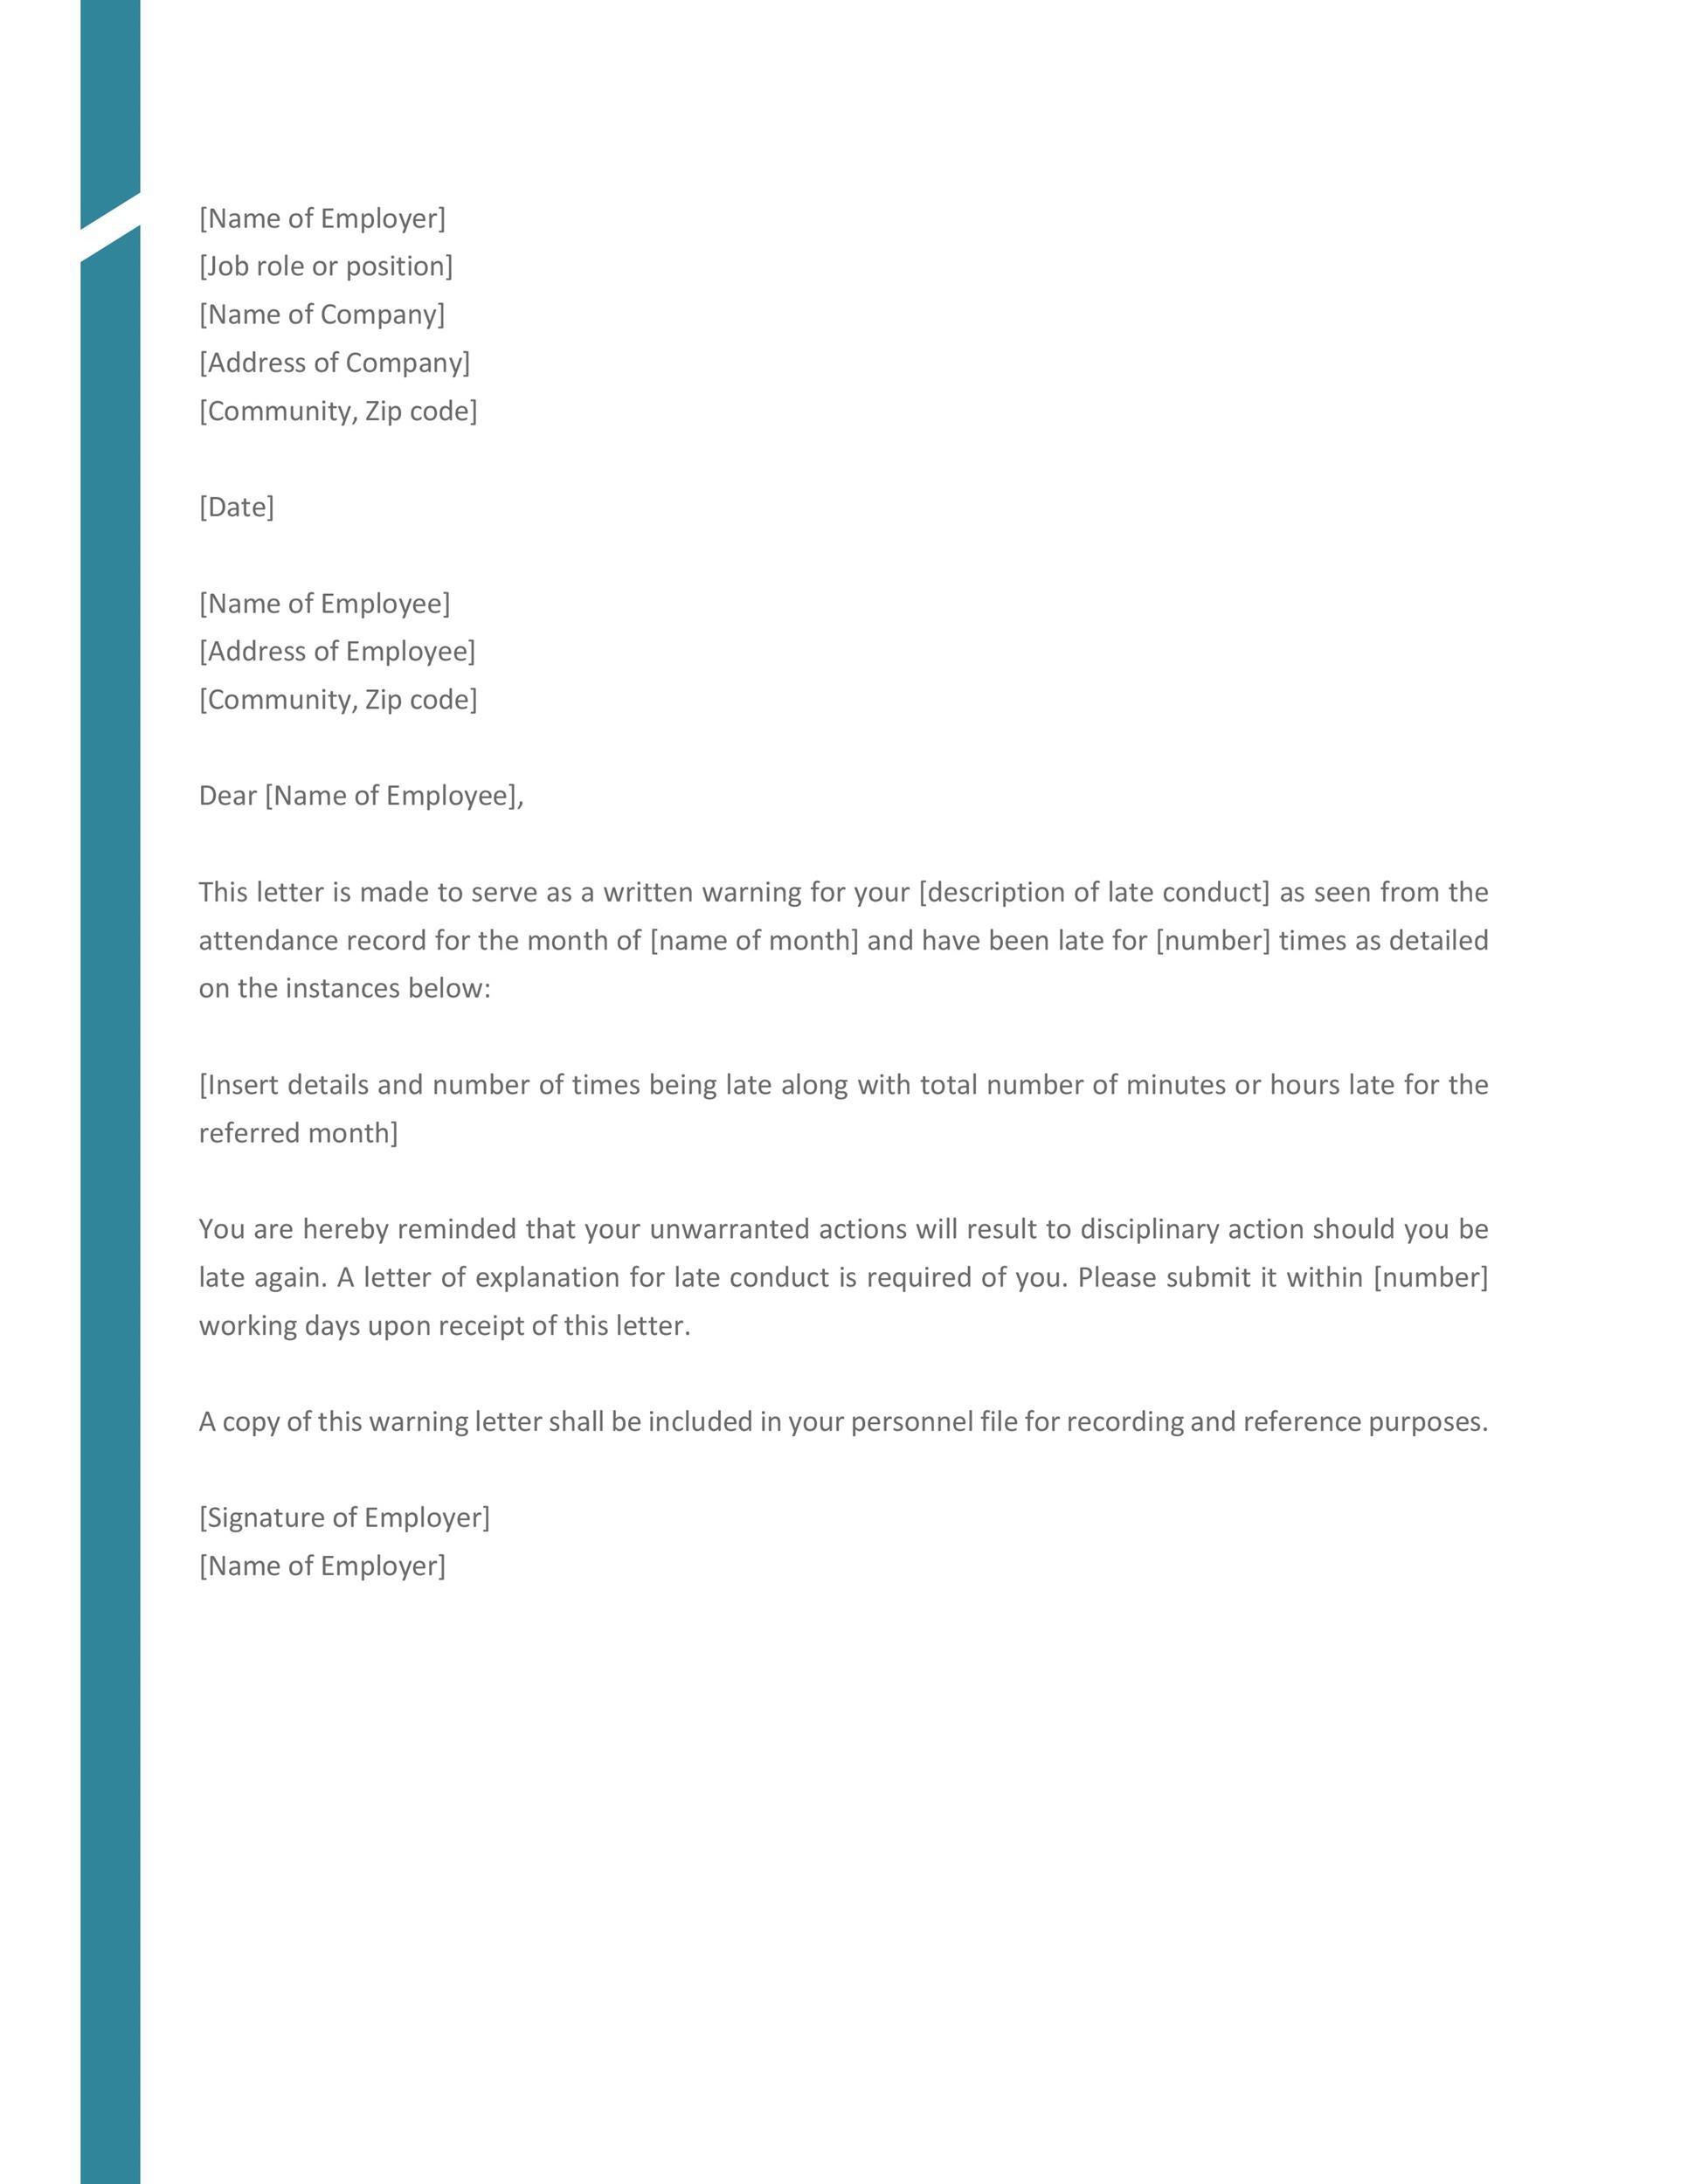 Free employee warning letter 27